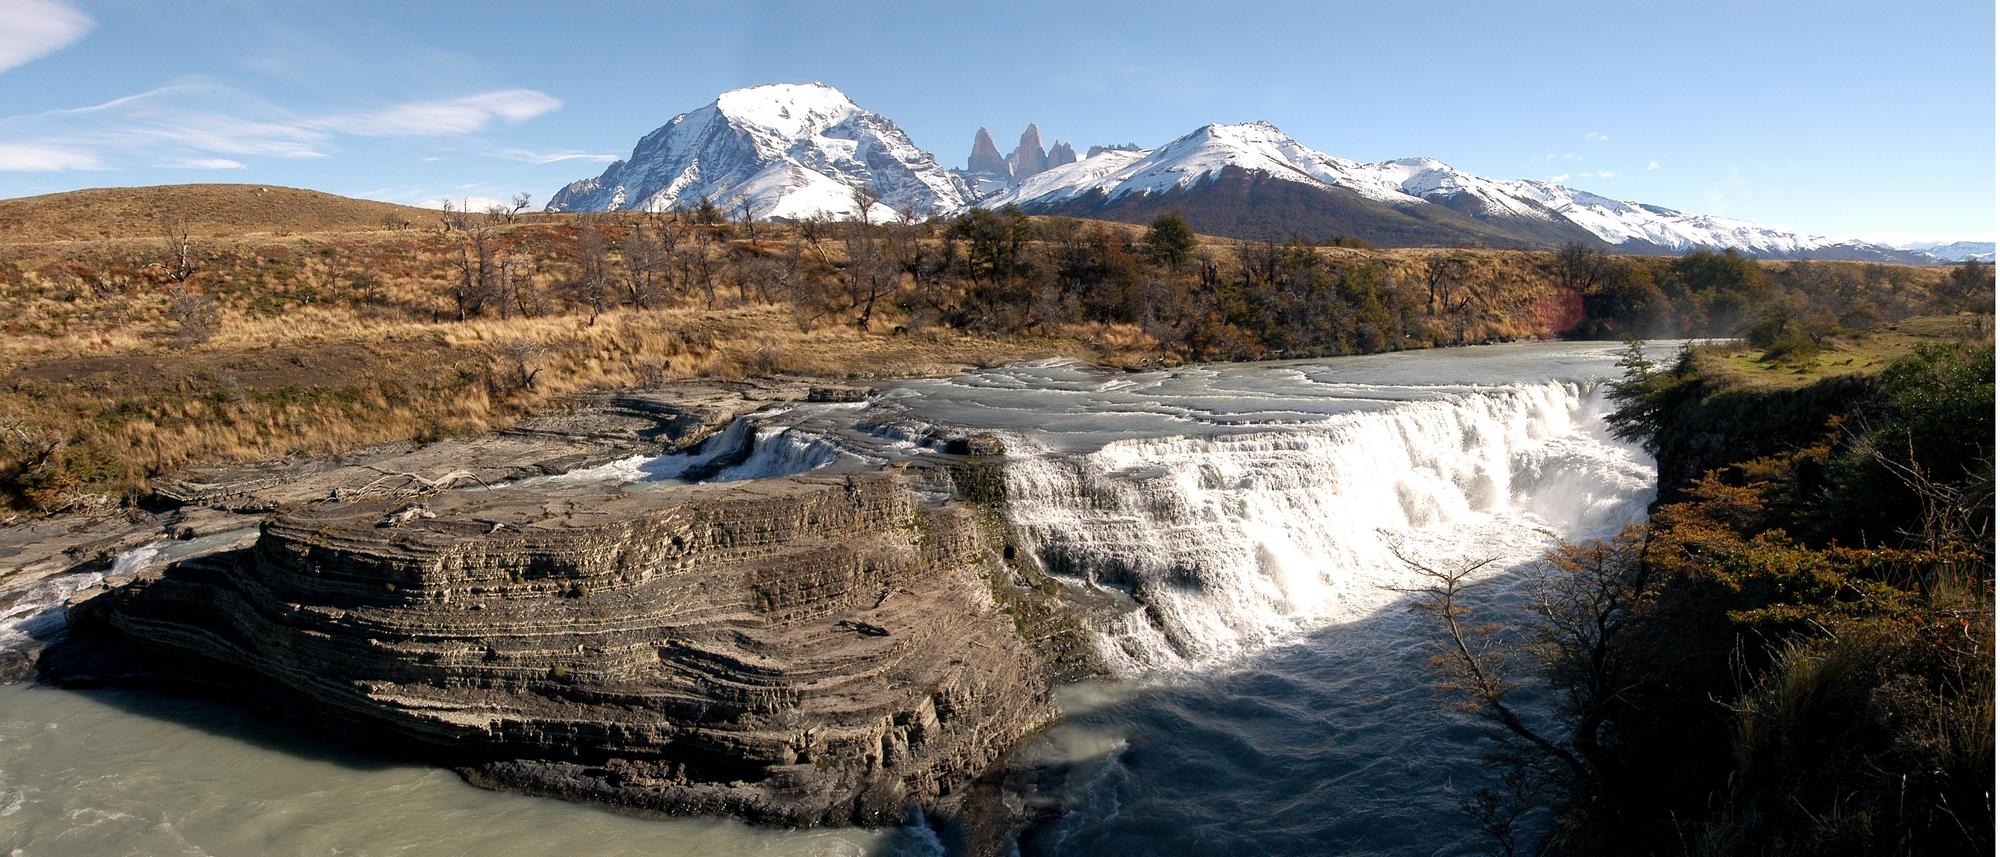 Cascada del río Paine, Chile